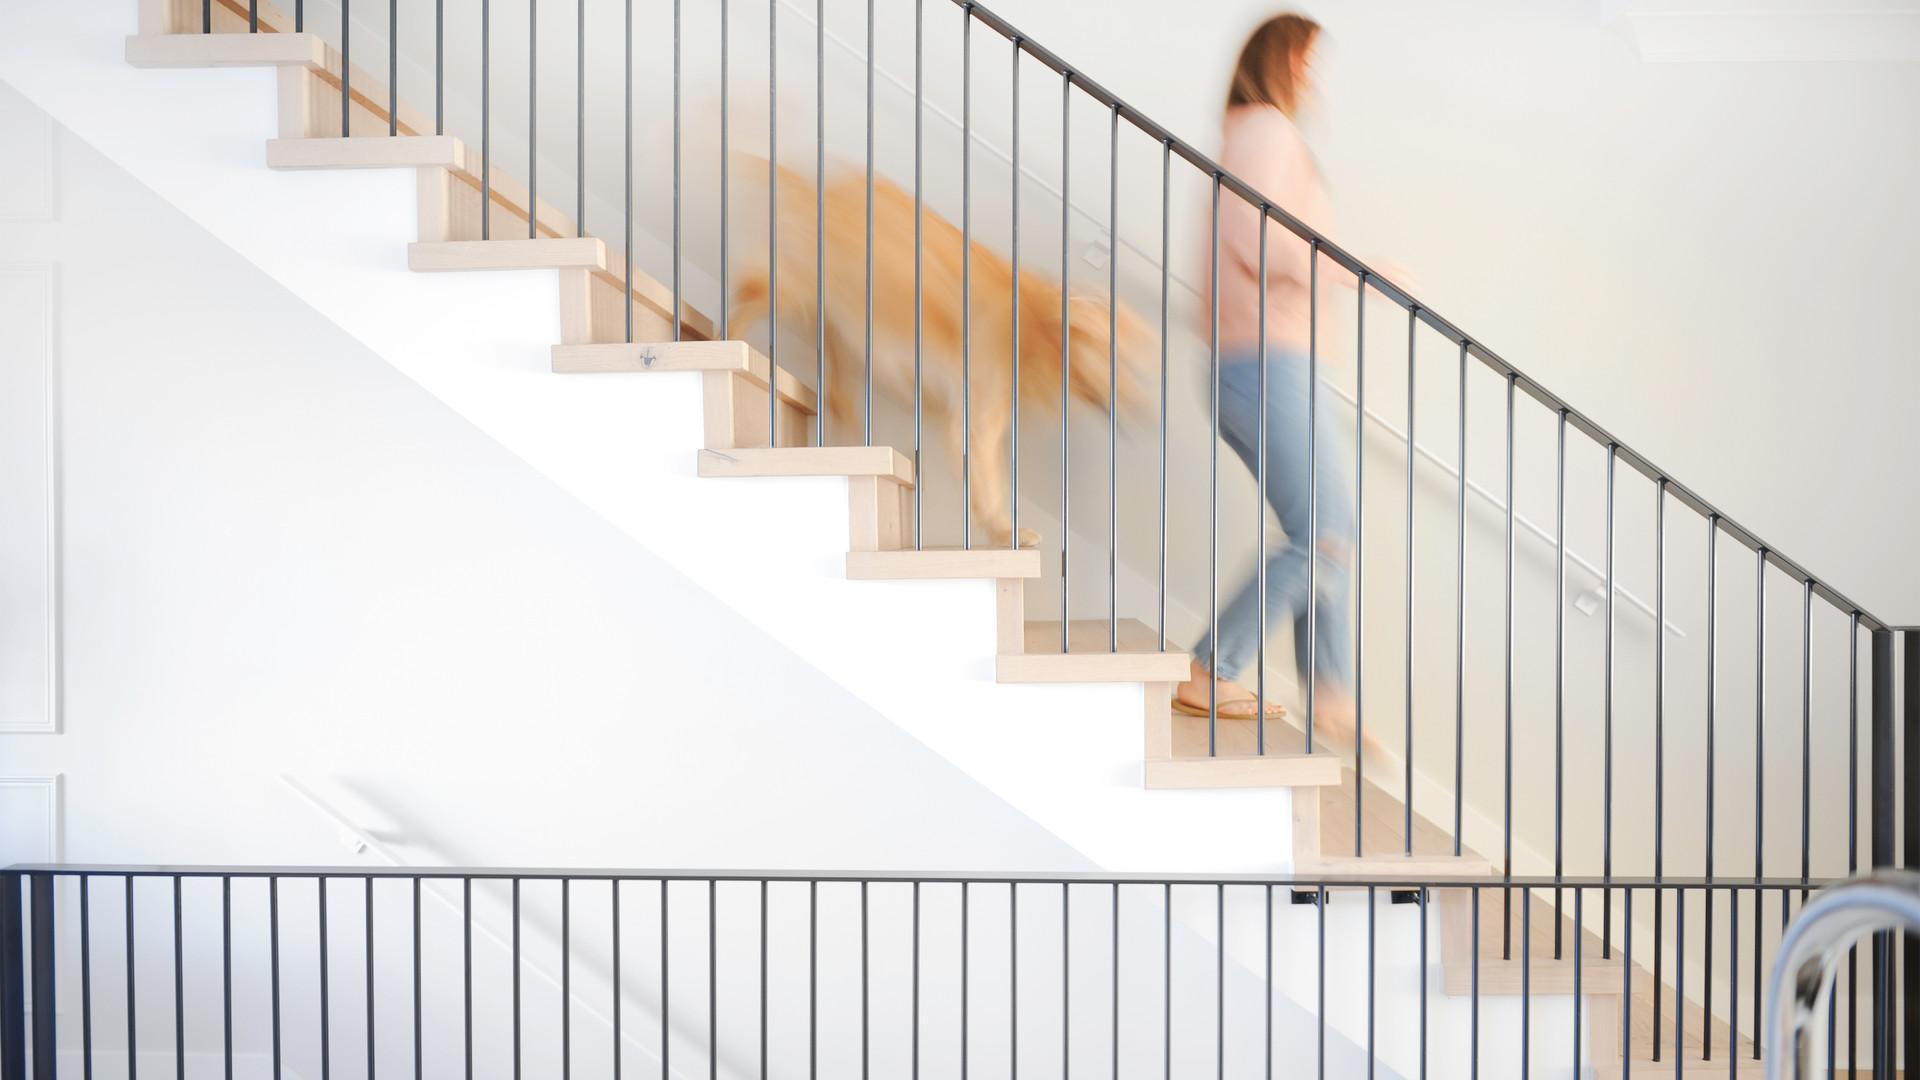 Stairs Blurred With Dug.jpg